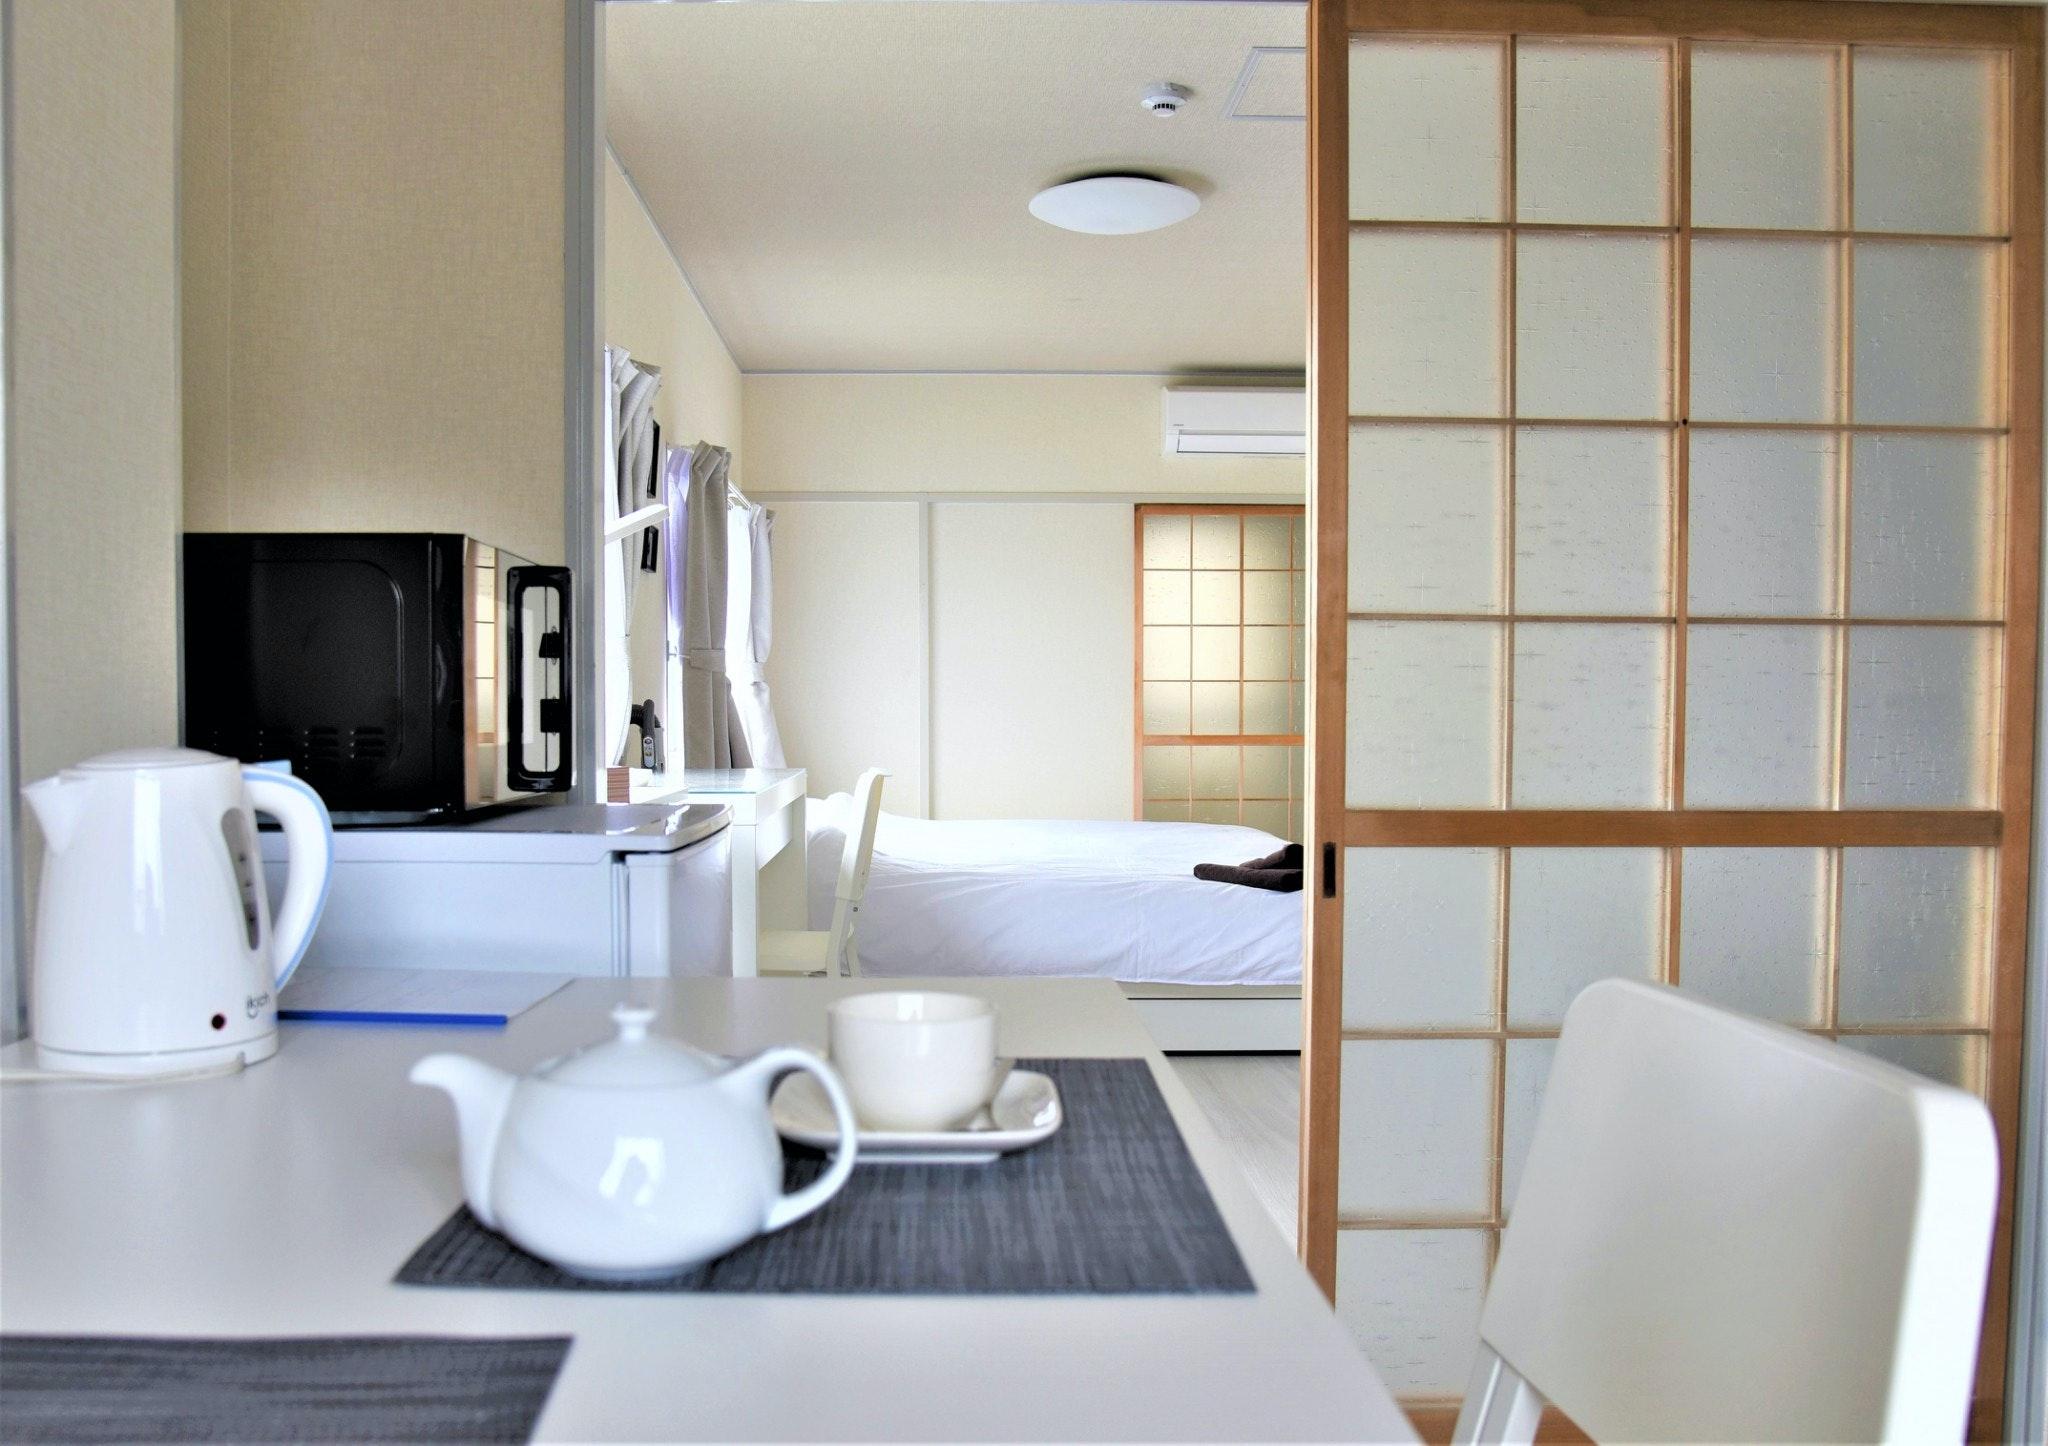 [AR1] 昔ながらの大阪の魅力な街にグランドオープン 観光地へのアクセス絶好 WIFI完備